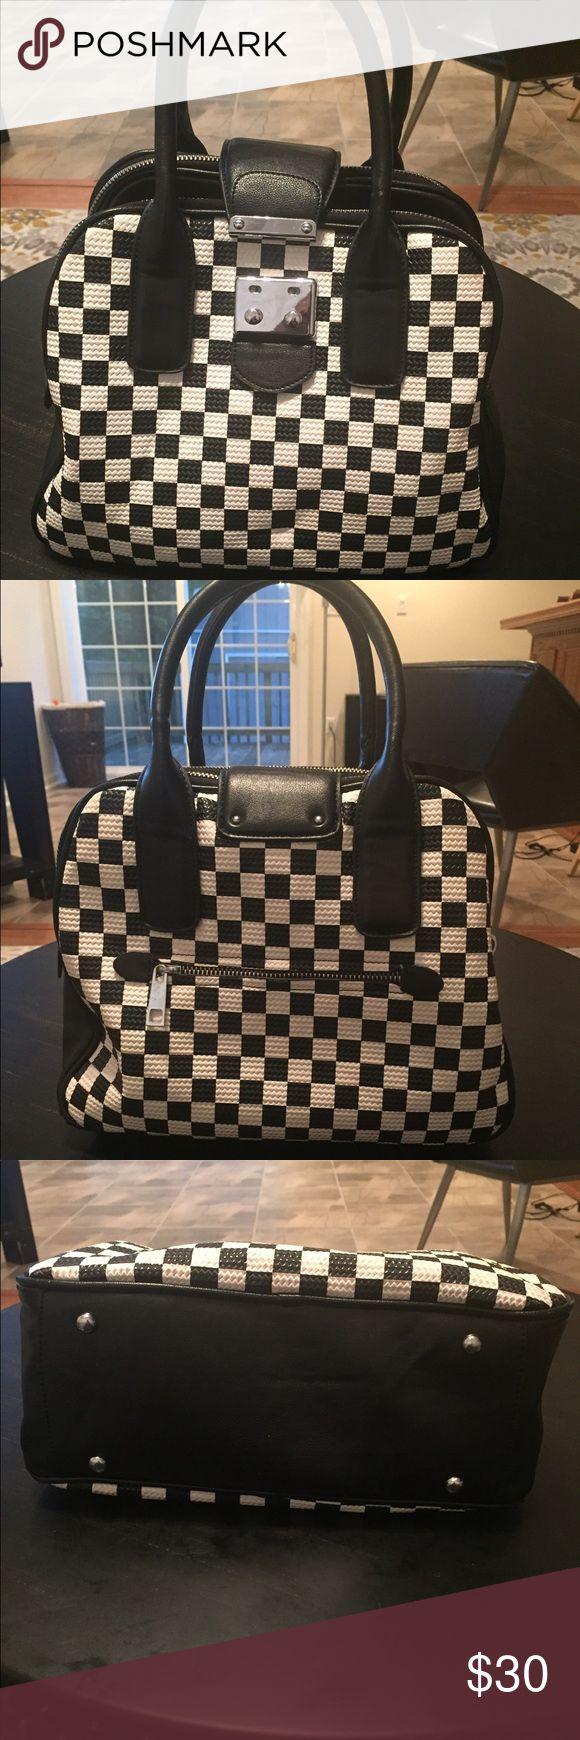 Selling this Checkered bowling bag. on Poshmark! My username is: honeyrenea. #shopmycloset #poshmark #fashion #shopping #style #forsale #Handbags